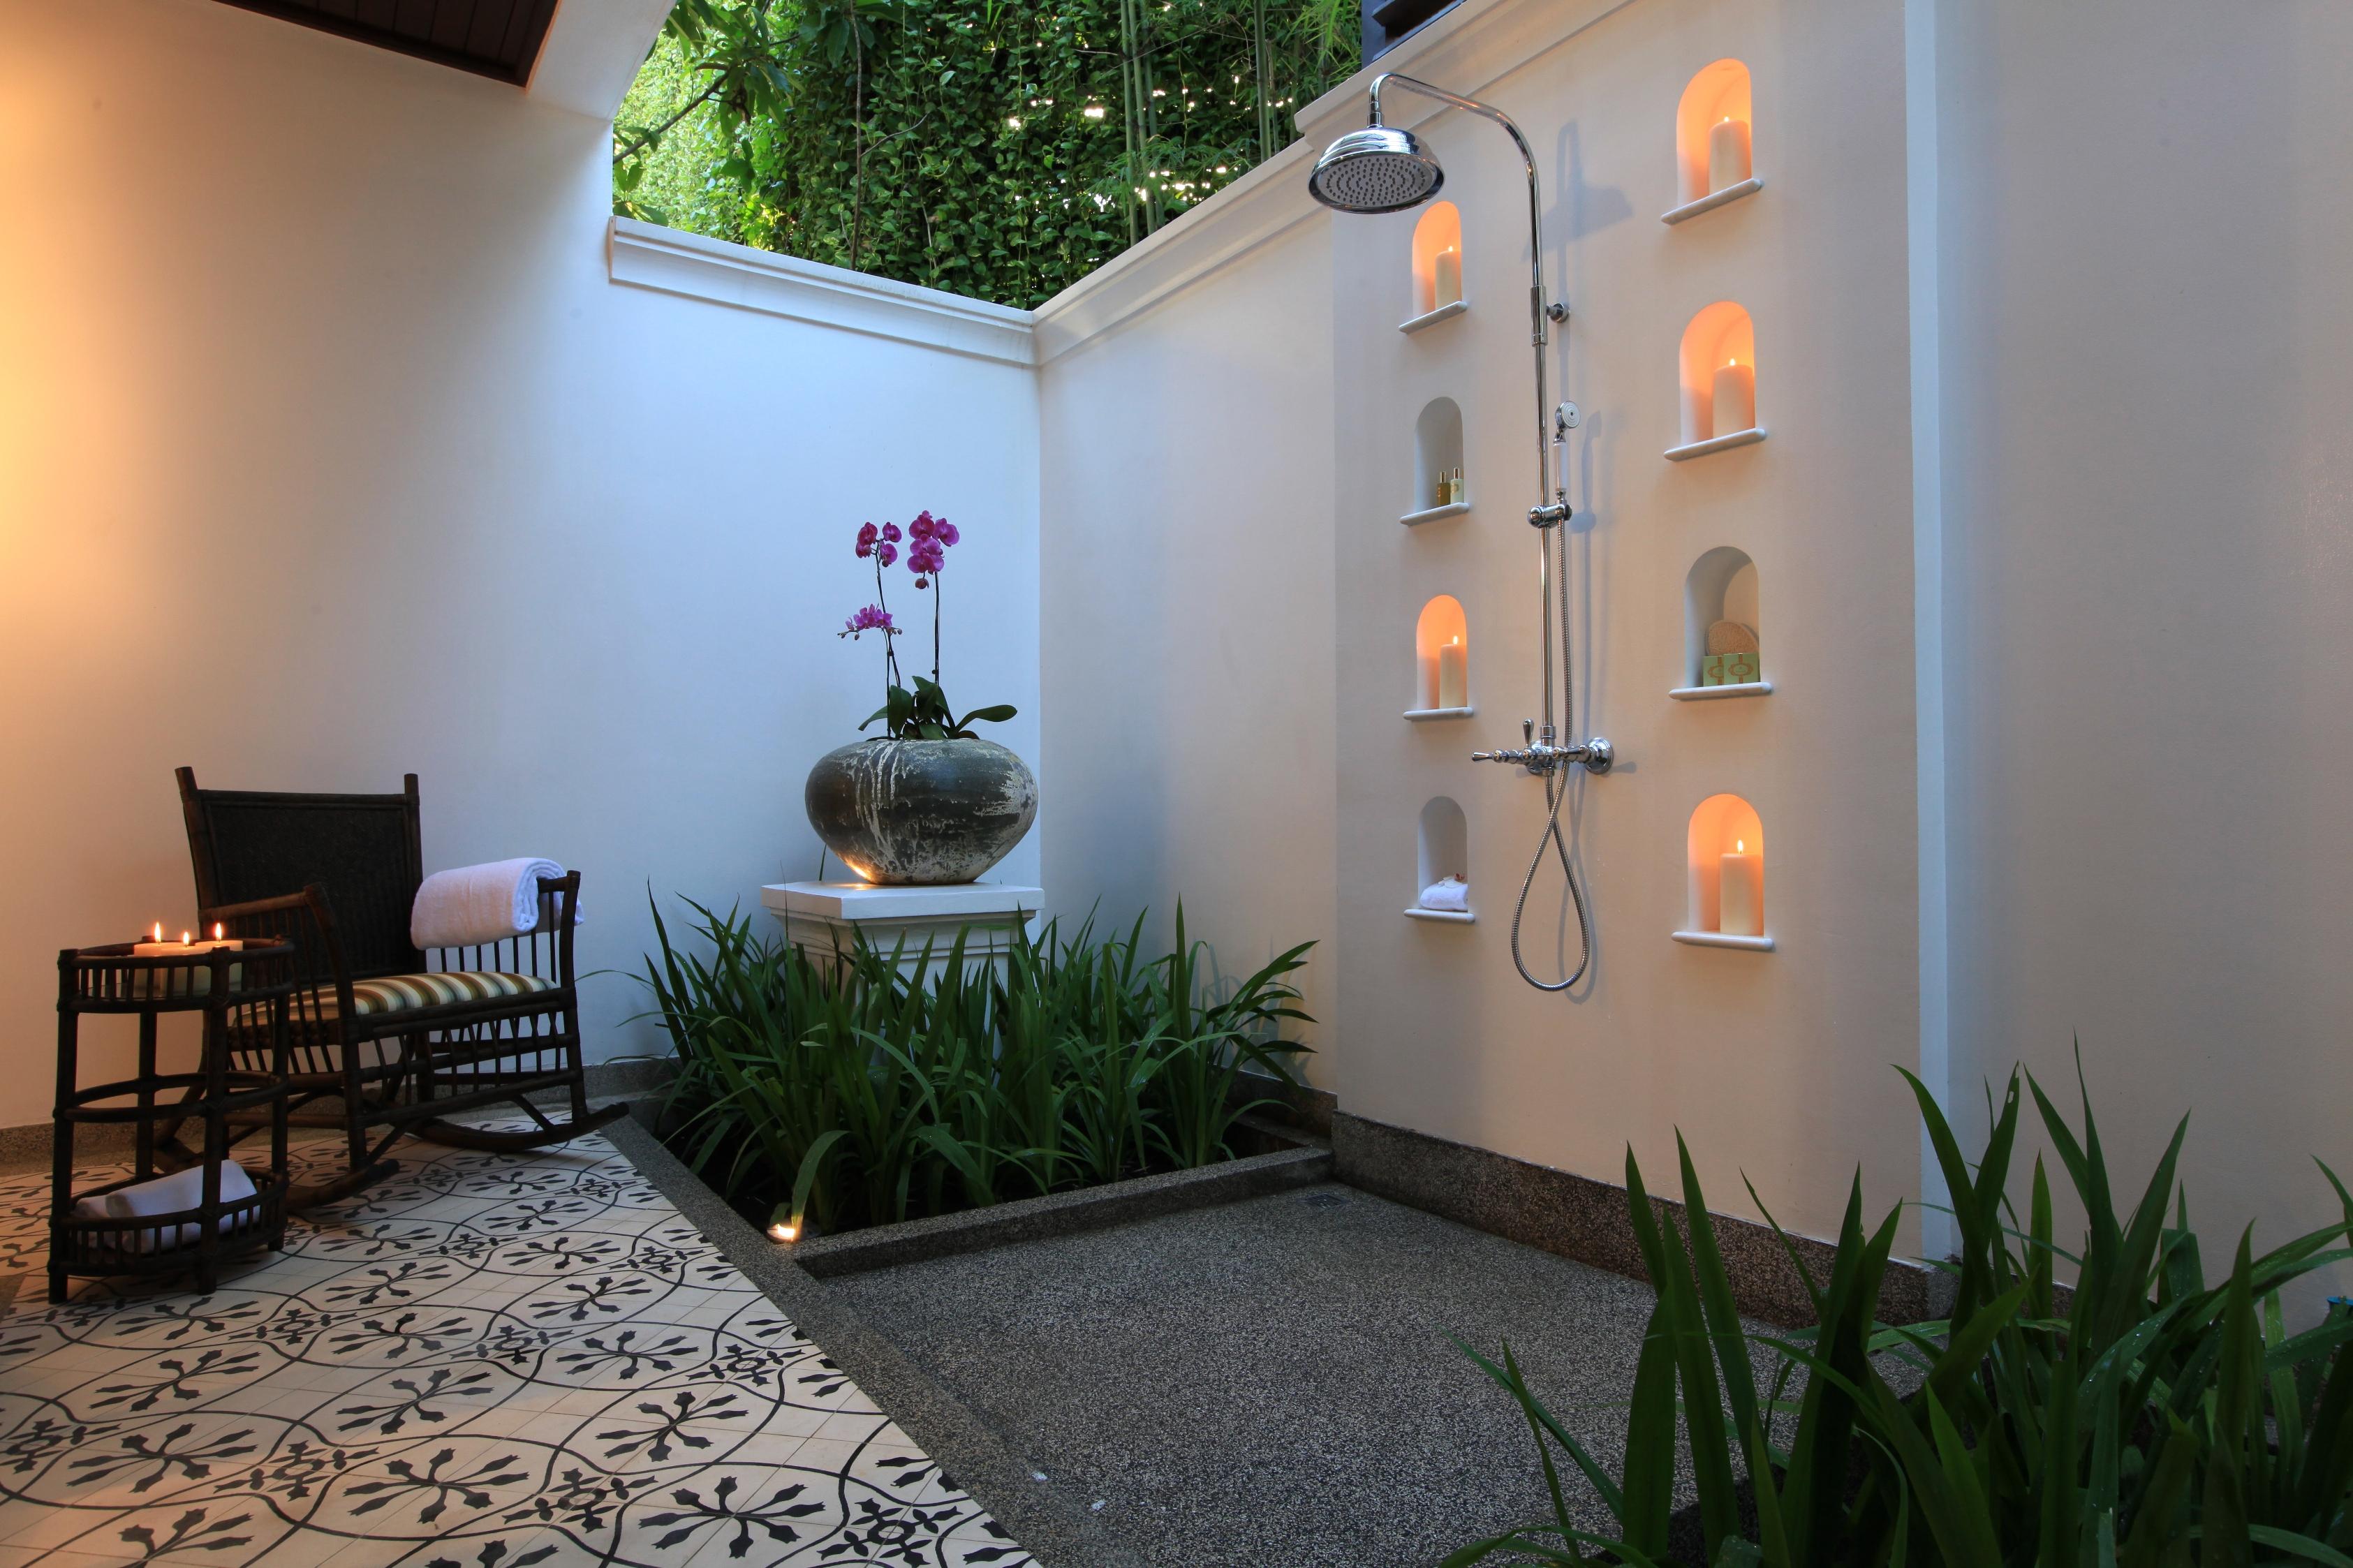 137 Pillars House Chiangmai, Thailand 18-1-12